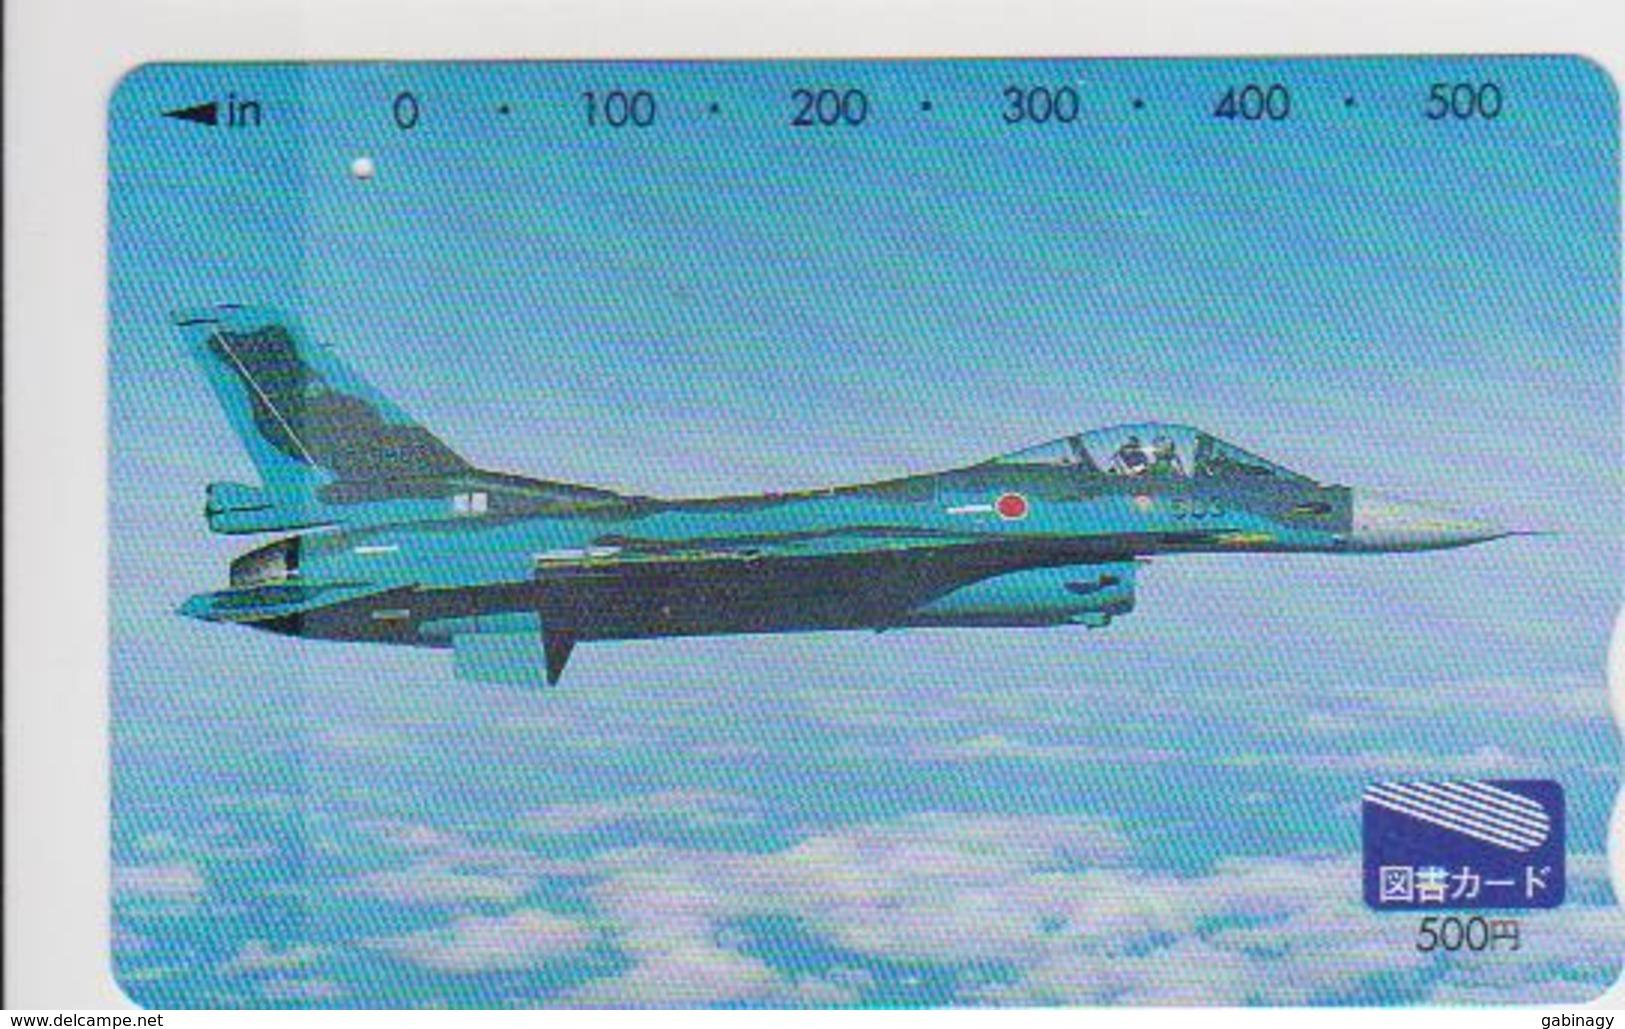 AIRPLANE - JAPAN-245 - MILITARY - TOSHO - Airplanes